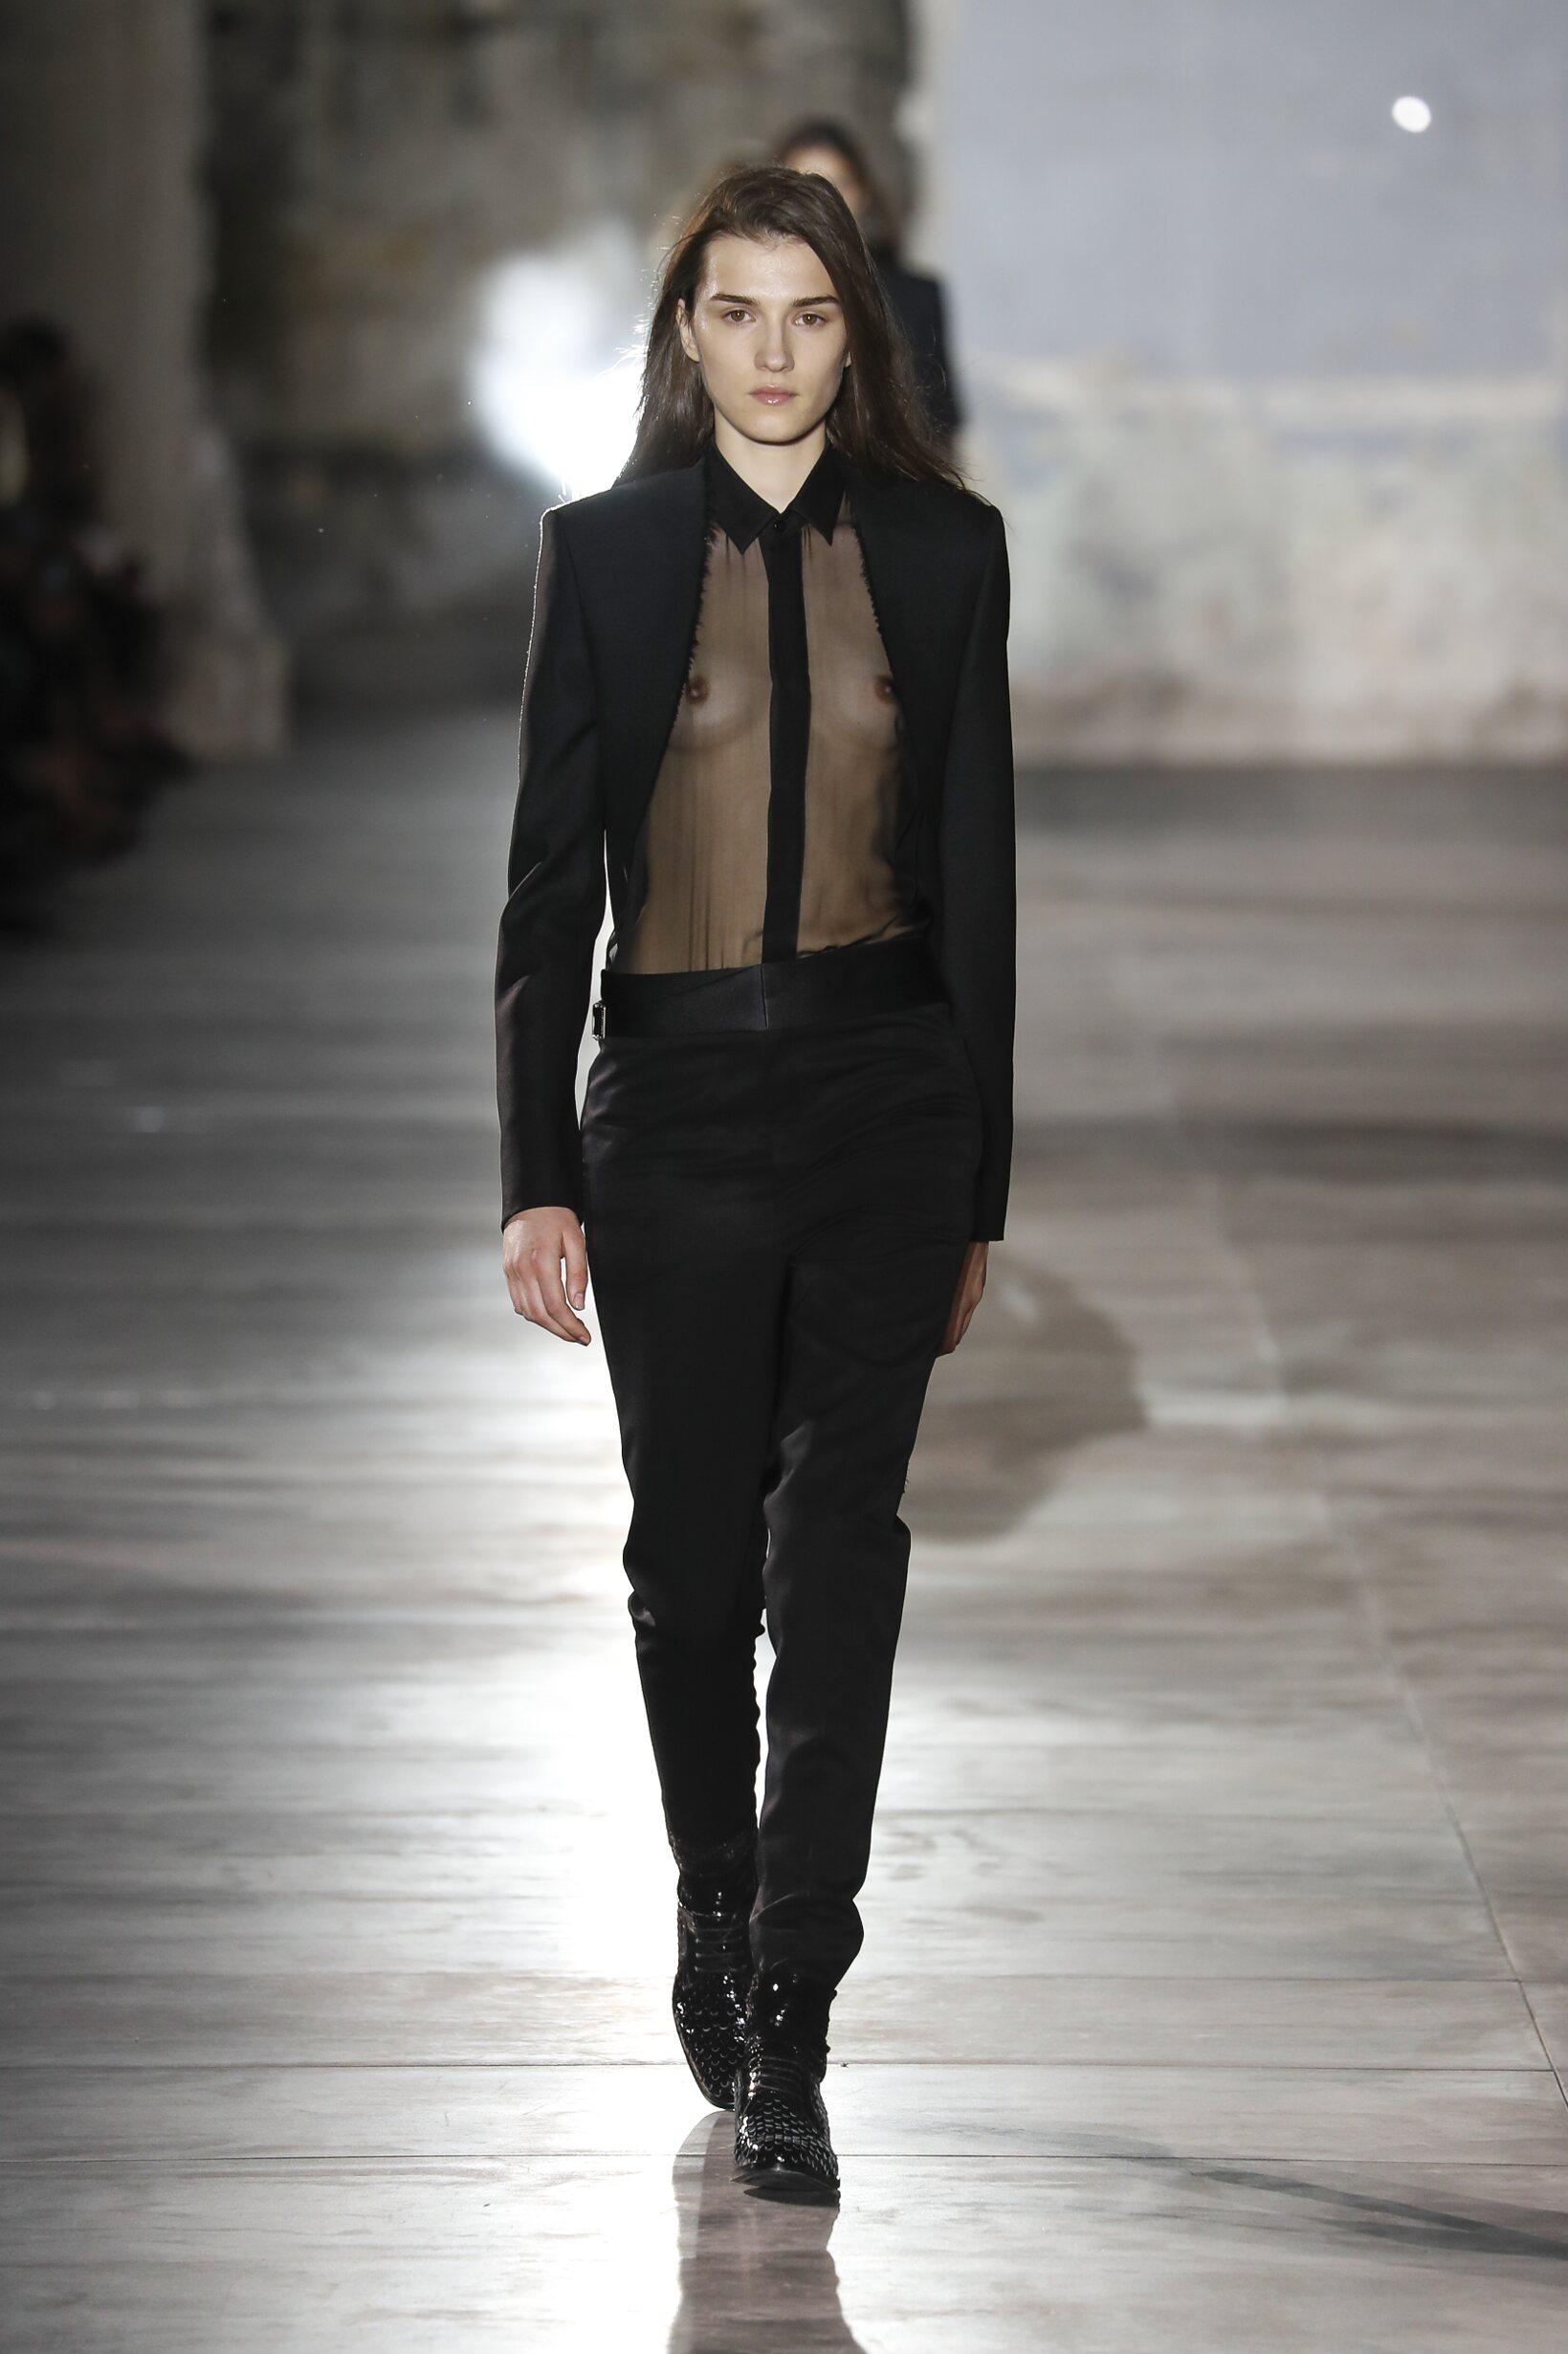 Saint Laurent SS 2017 Womenswear